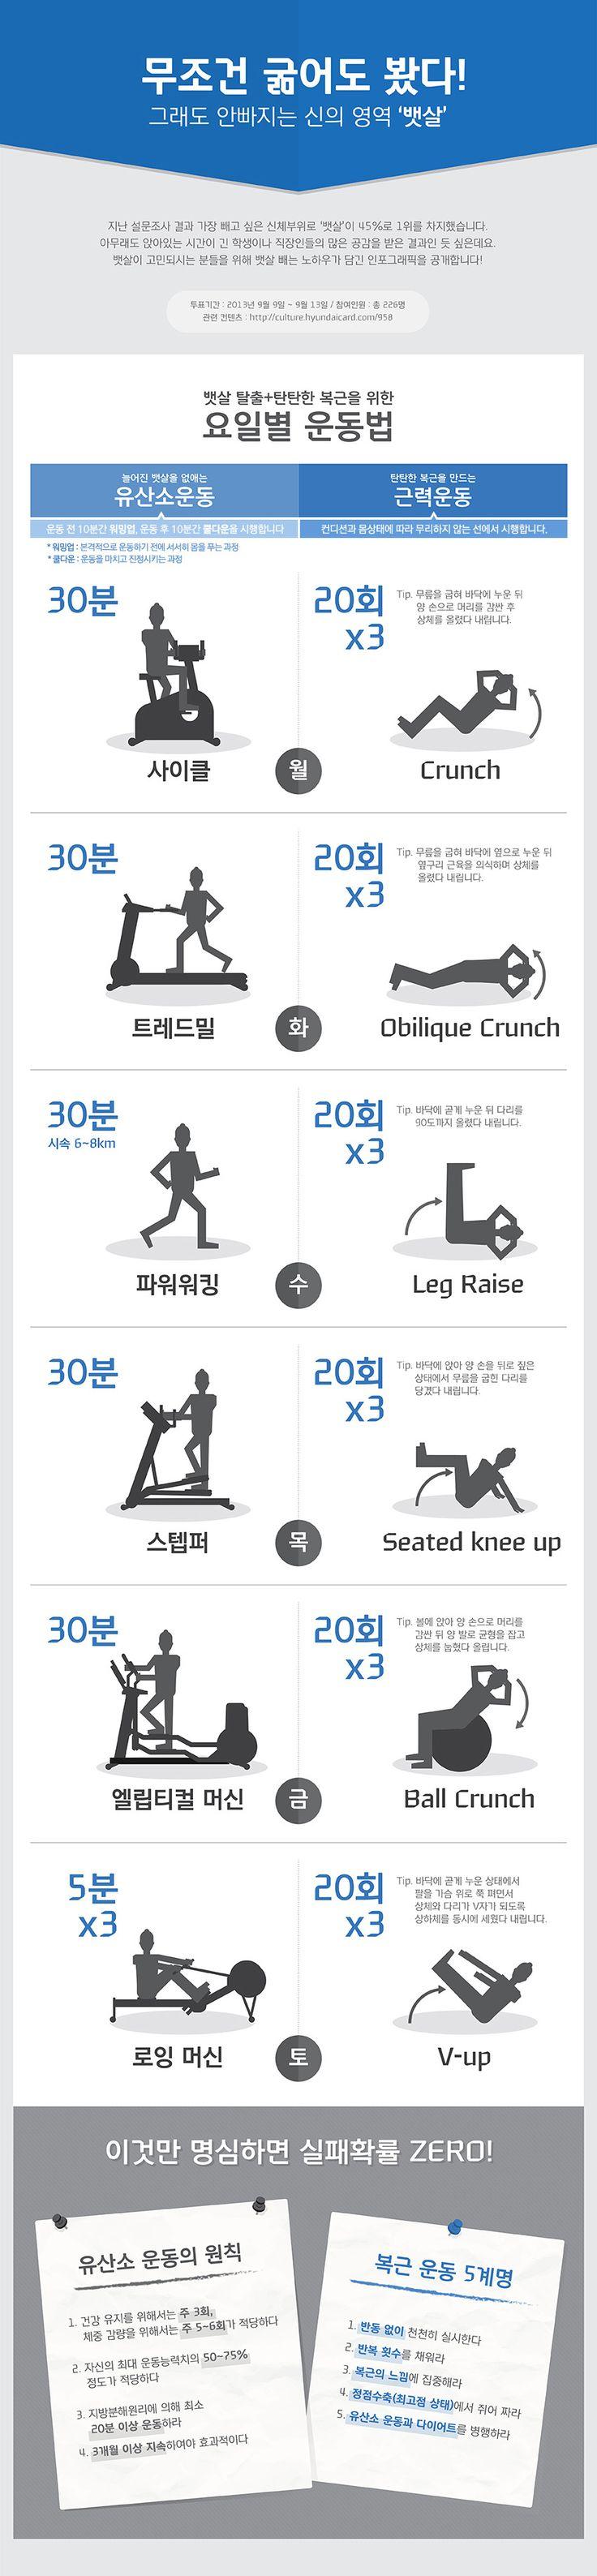 [Infographic] 뱃살을 빼기 위한 요일별 운동법에 관한 인포그래픽